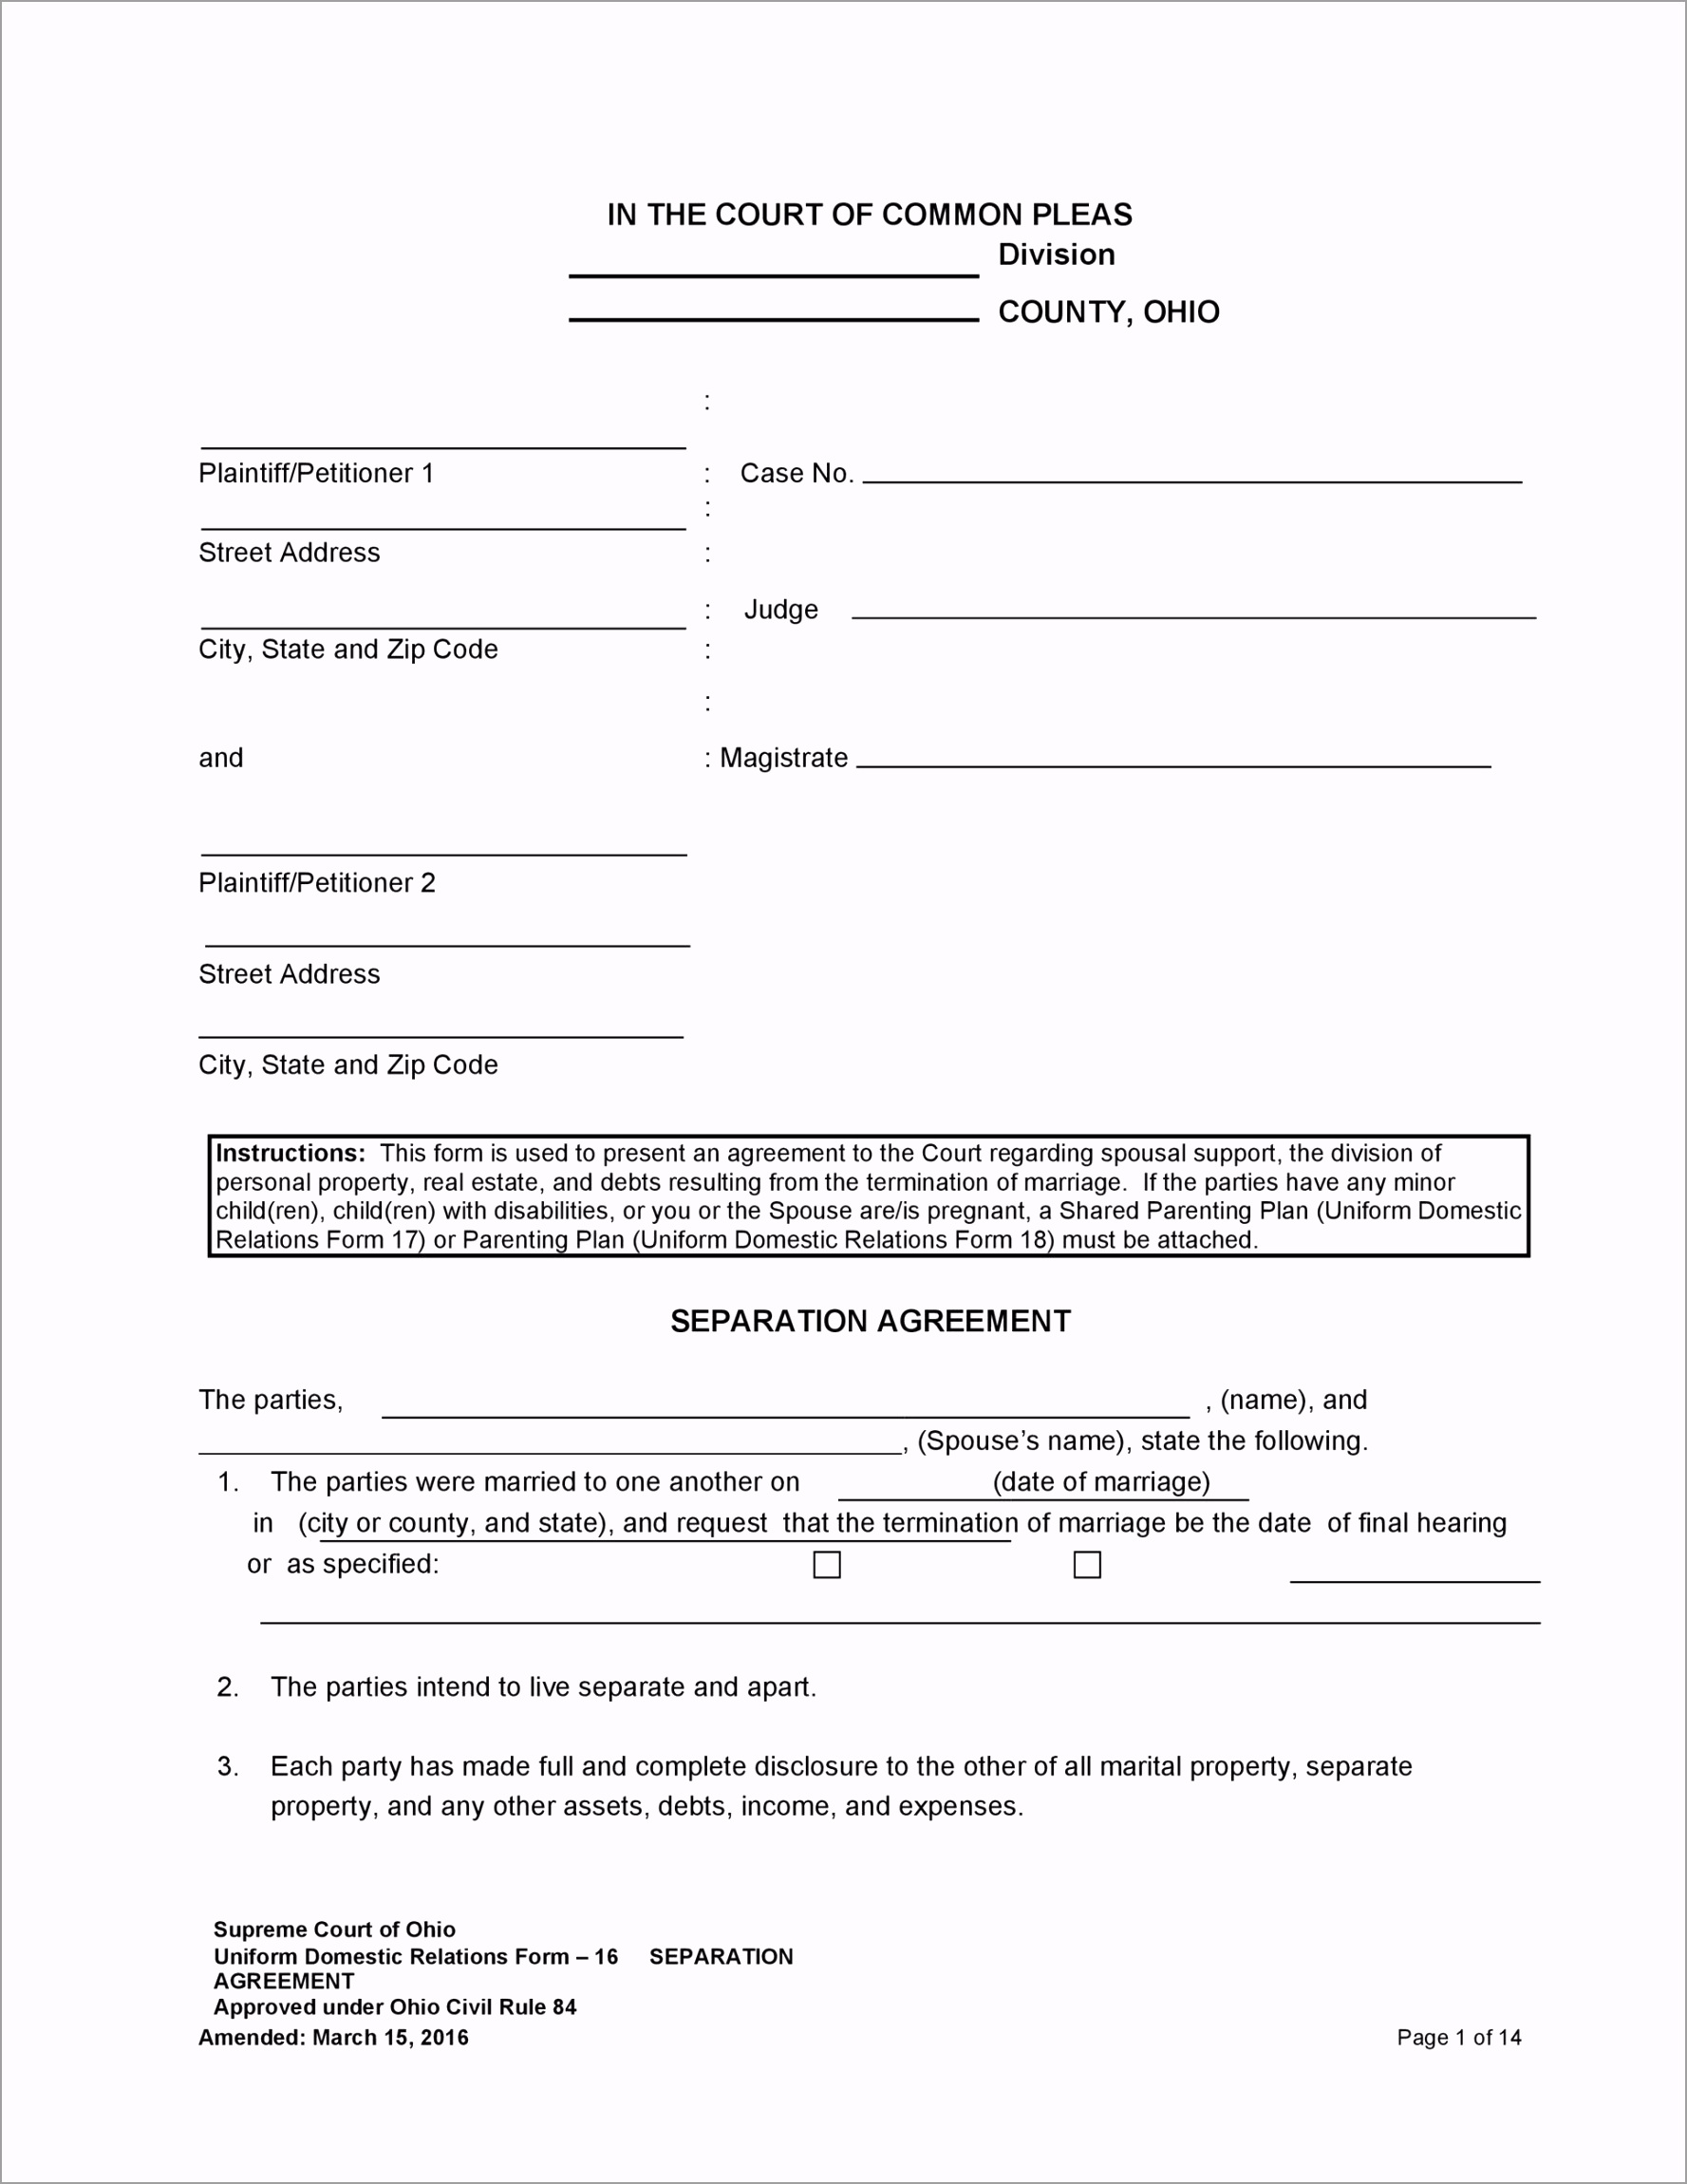 Separation Agreement Template 29 iorrw